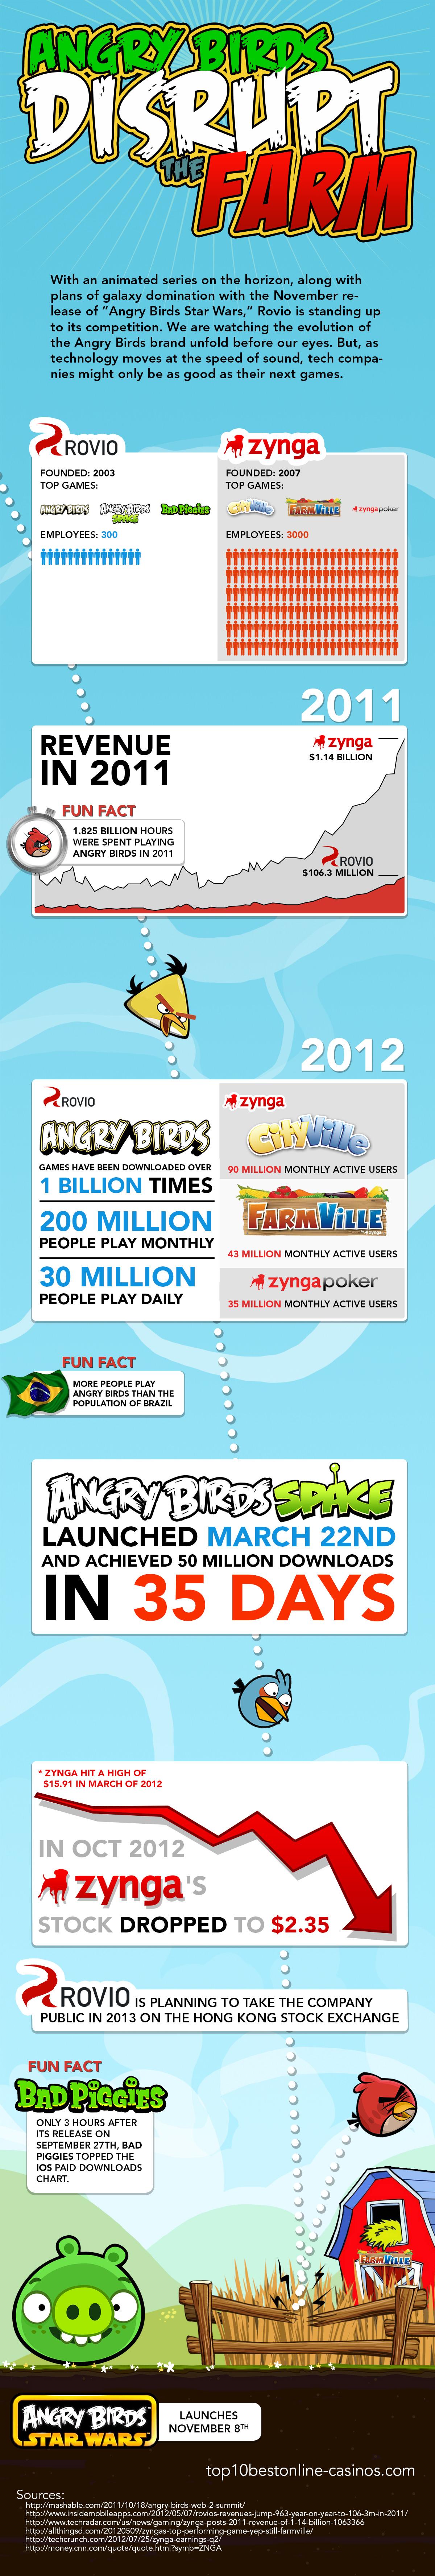 Angry Birds Disrupt Zynga's Farm